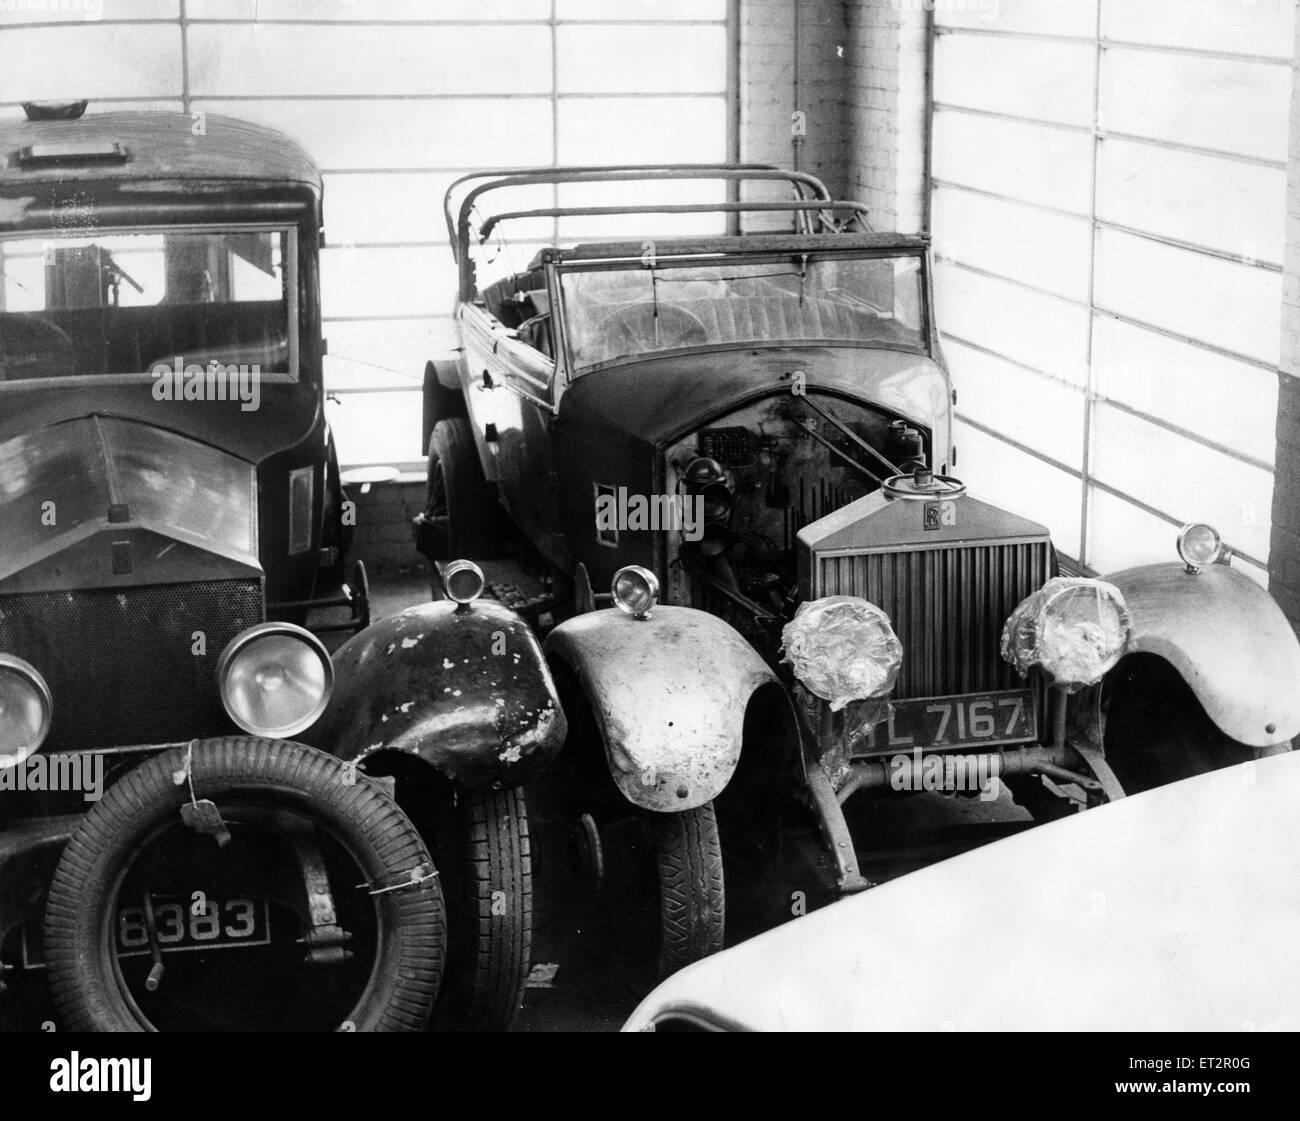 Veteran Rolls Royce, 22nd June 1966. - Stock Image